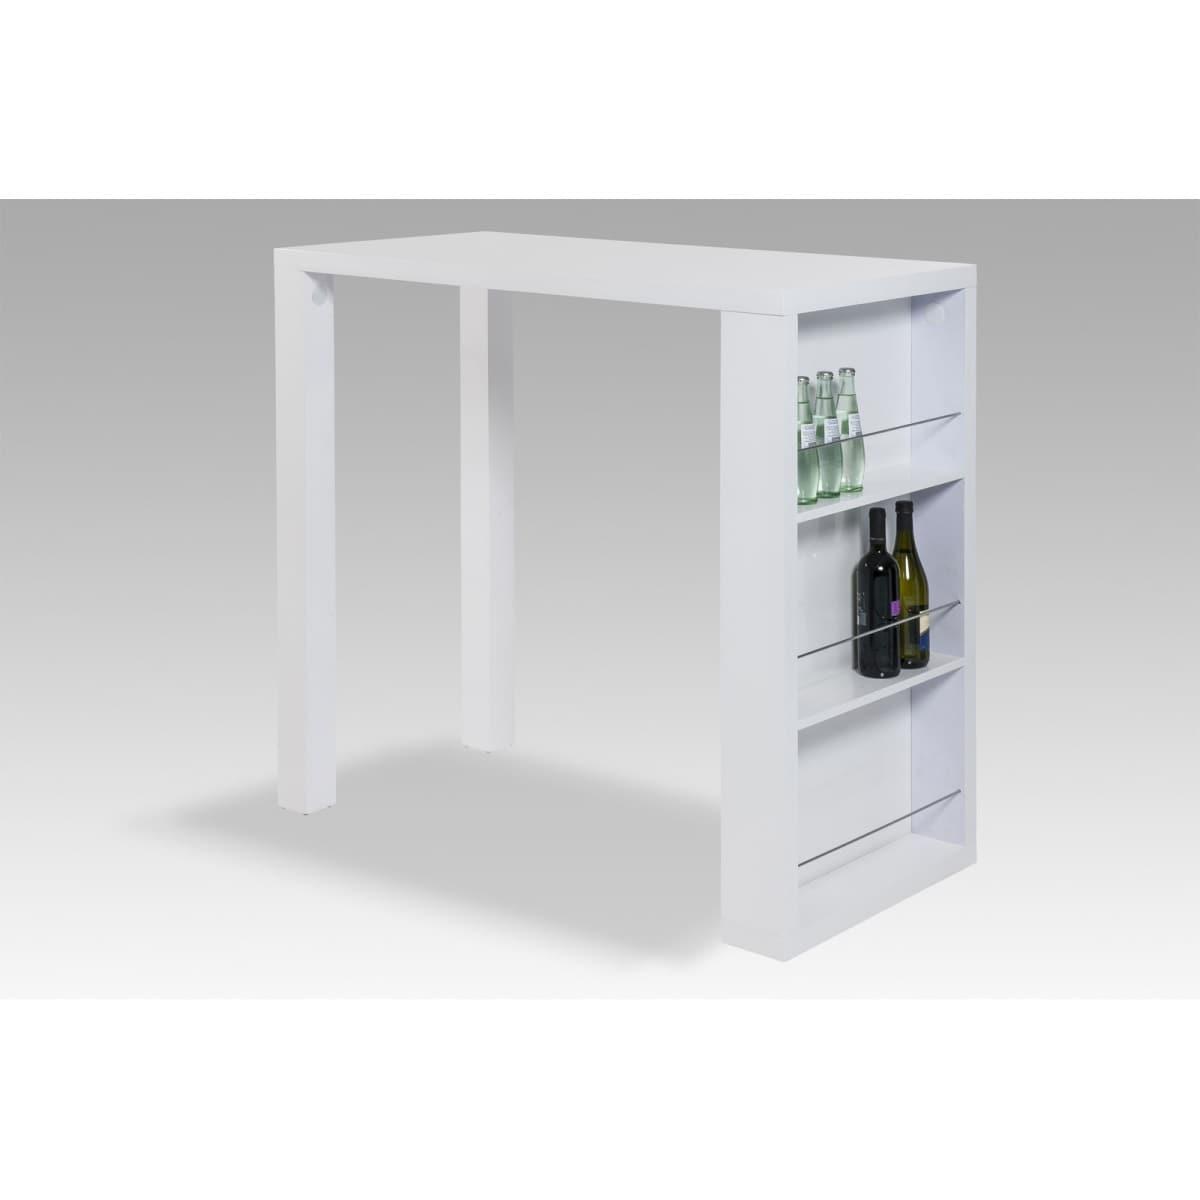 bartisch ike wei hochglanz ca 120 x 110 x 60 cm porta. Black Bedroom Furniture Sets. Home Design Ideas